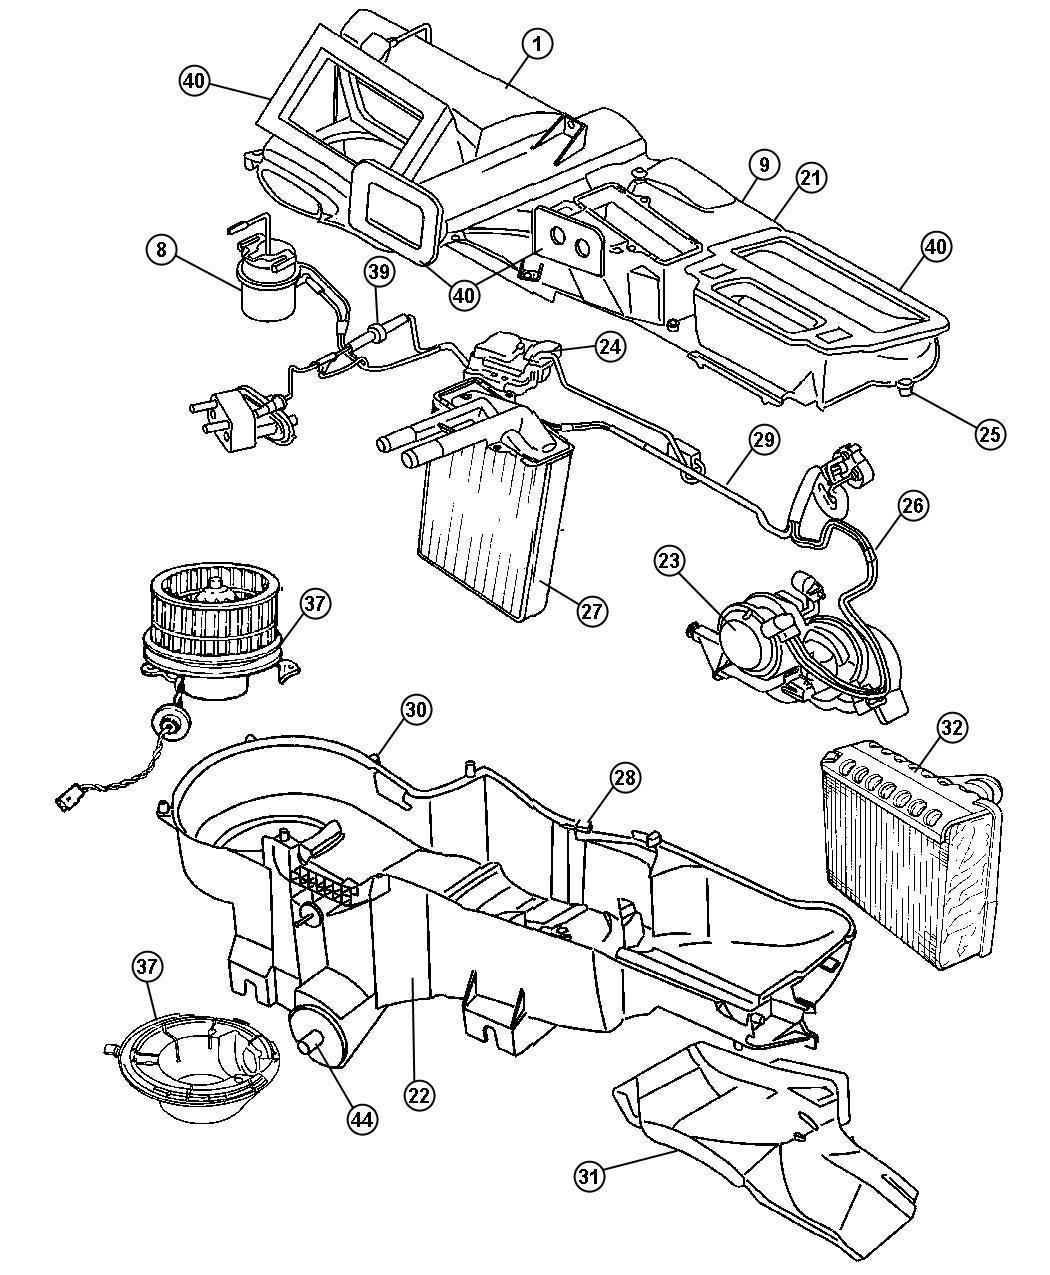 2006 Jeep Liberty Evaporator Kit  Air Conditioning